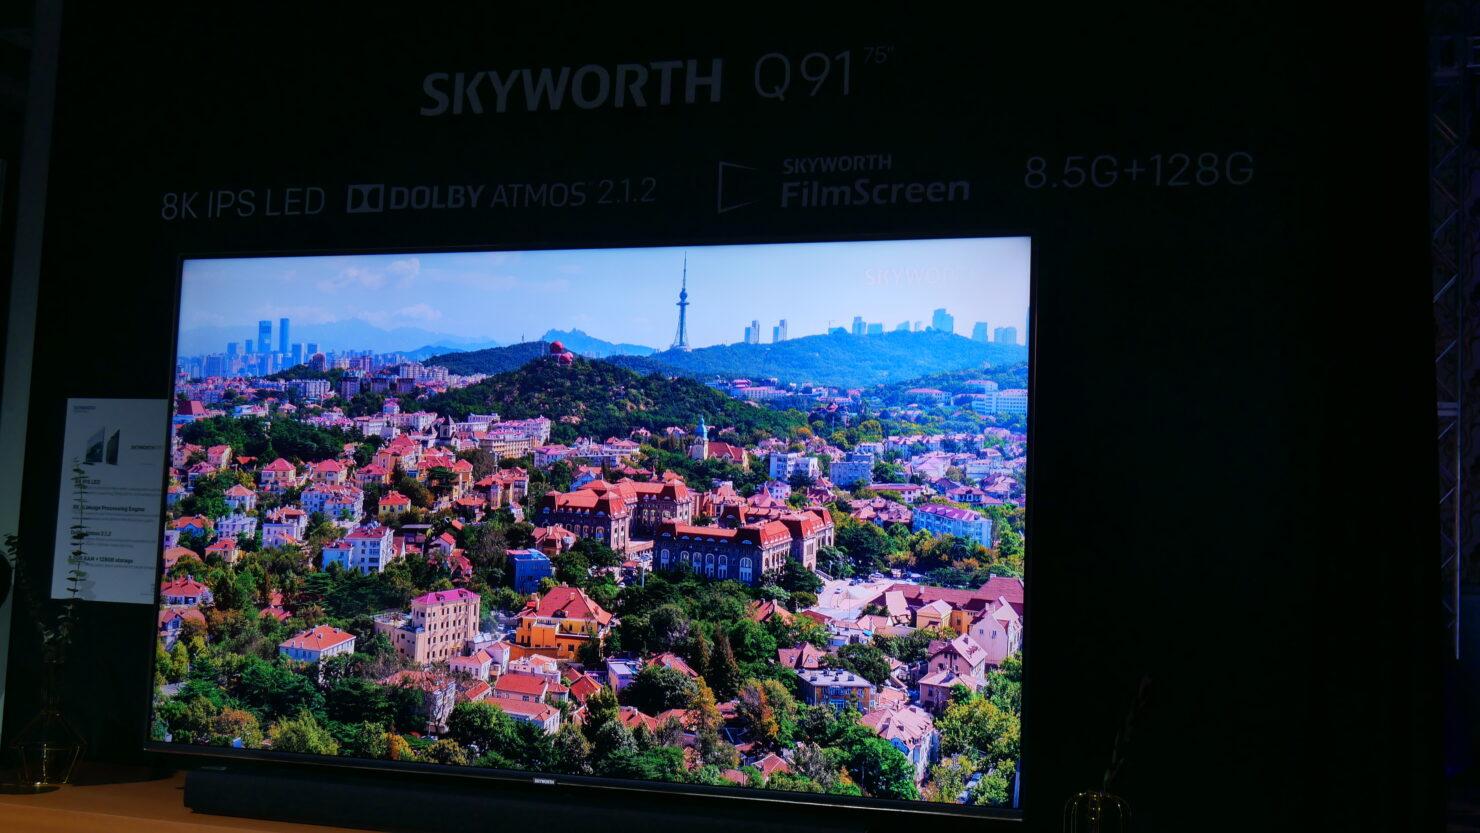 skyworth-ces-q91-side